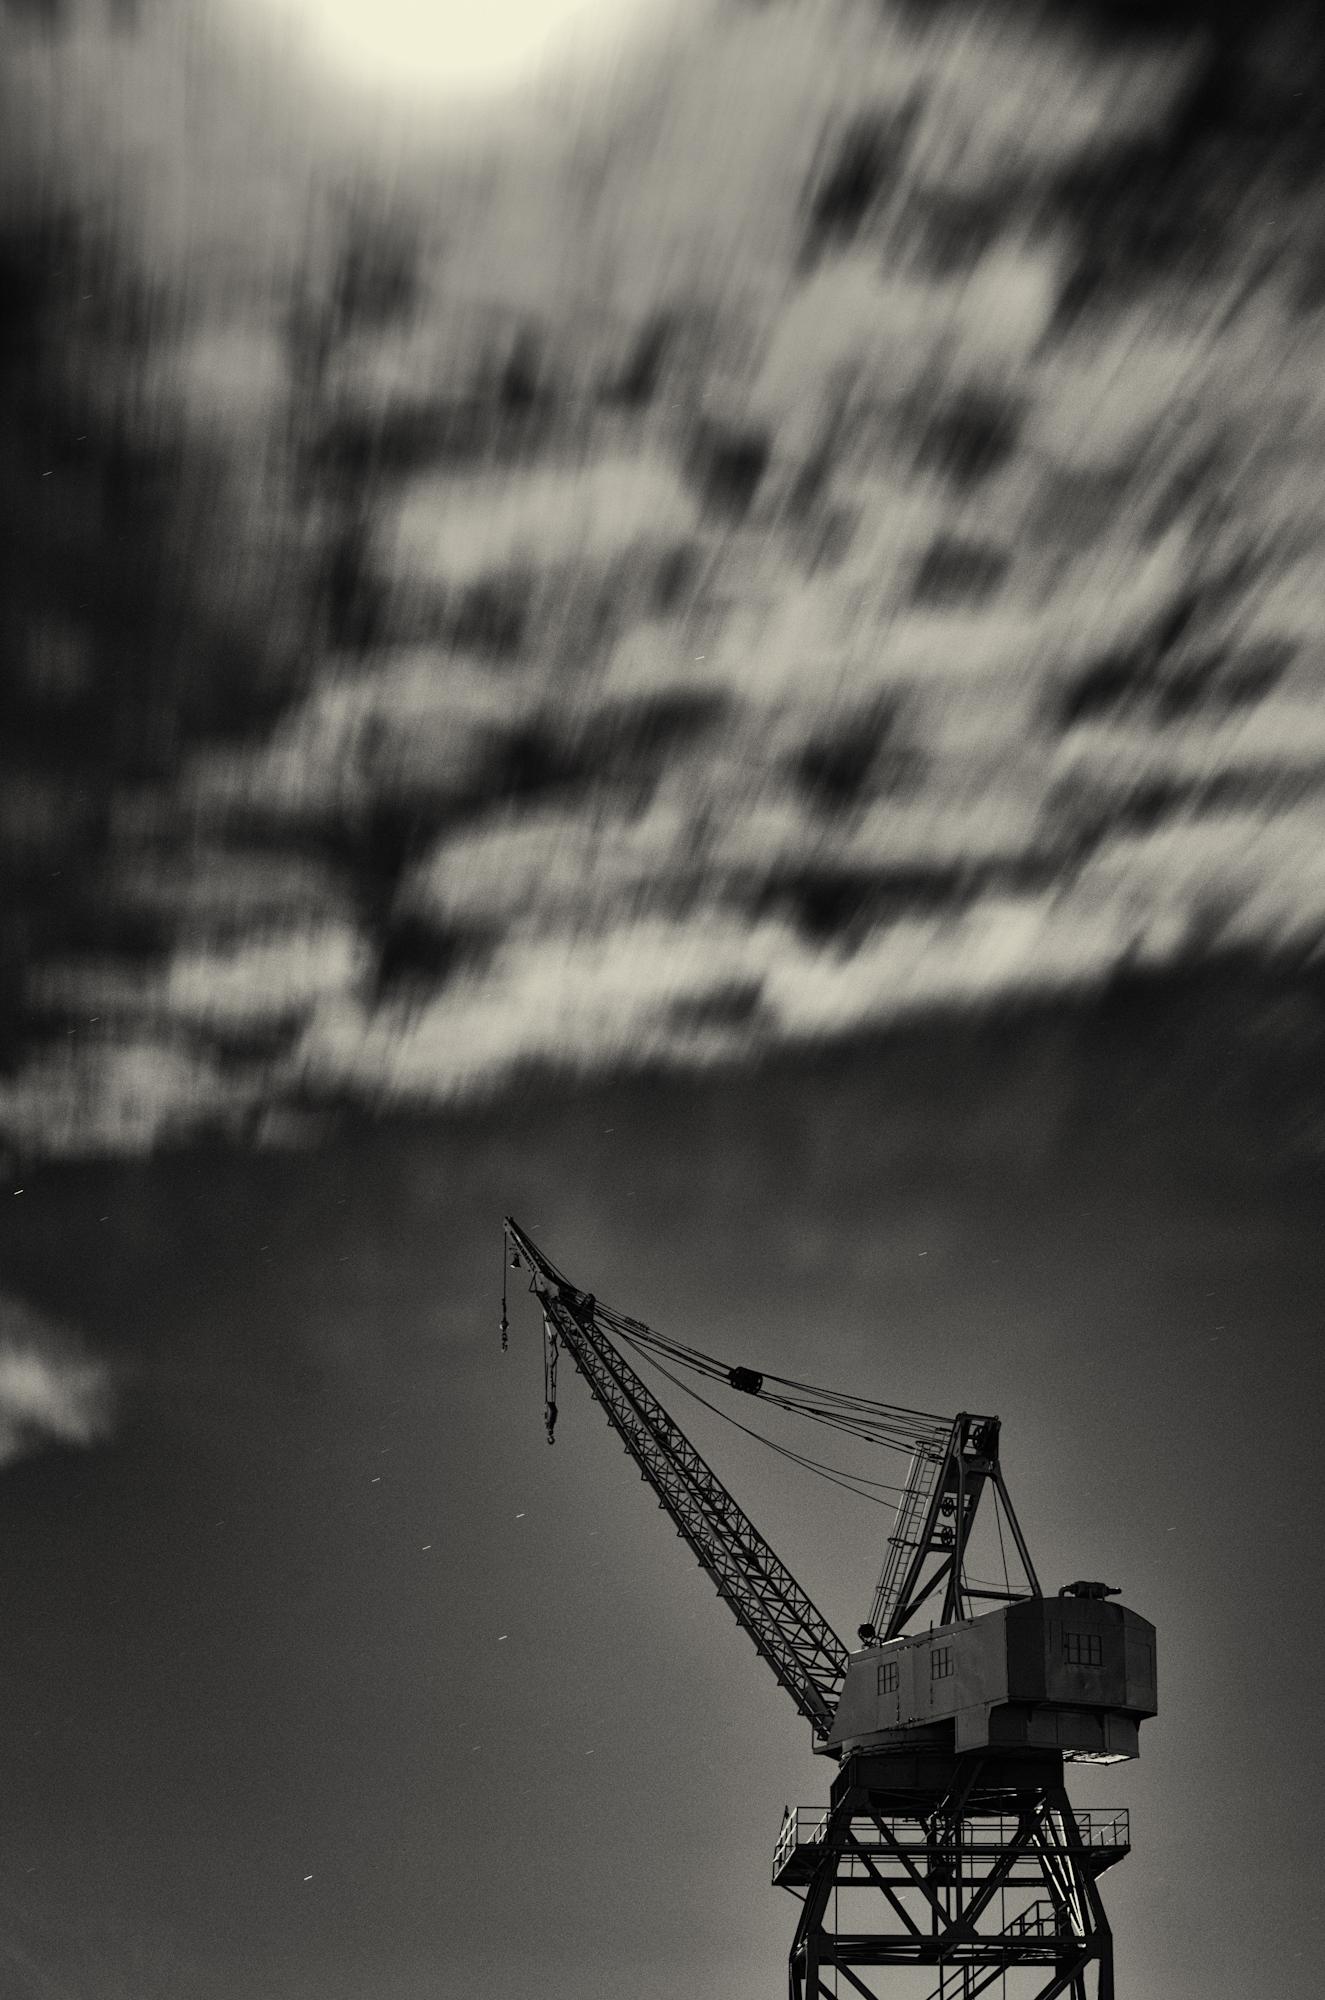 Red Hook - IKEA crane